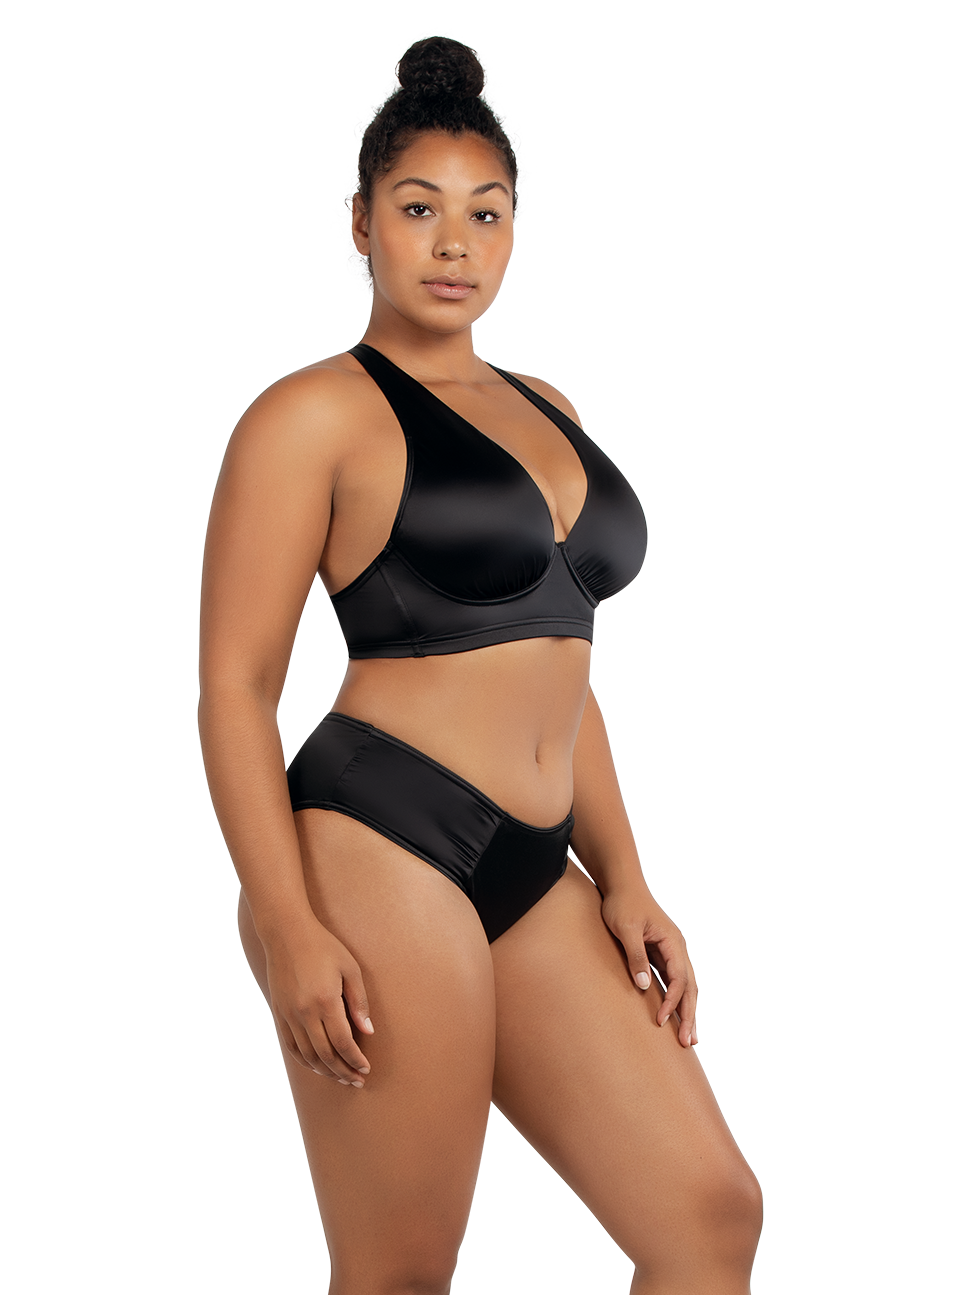 PARFAIT Rita LonglinePlungeTopS8142 BikiniBottomS8143 Black Side - Rita Longline Plunge Top Black S8142